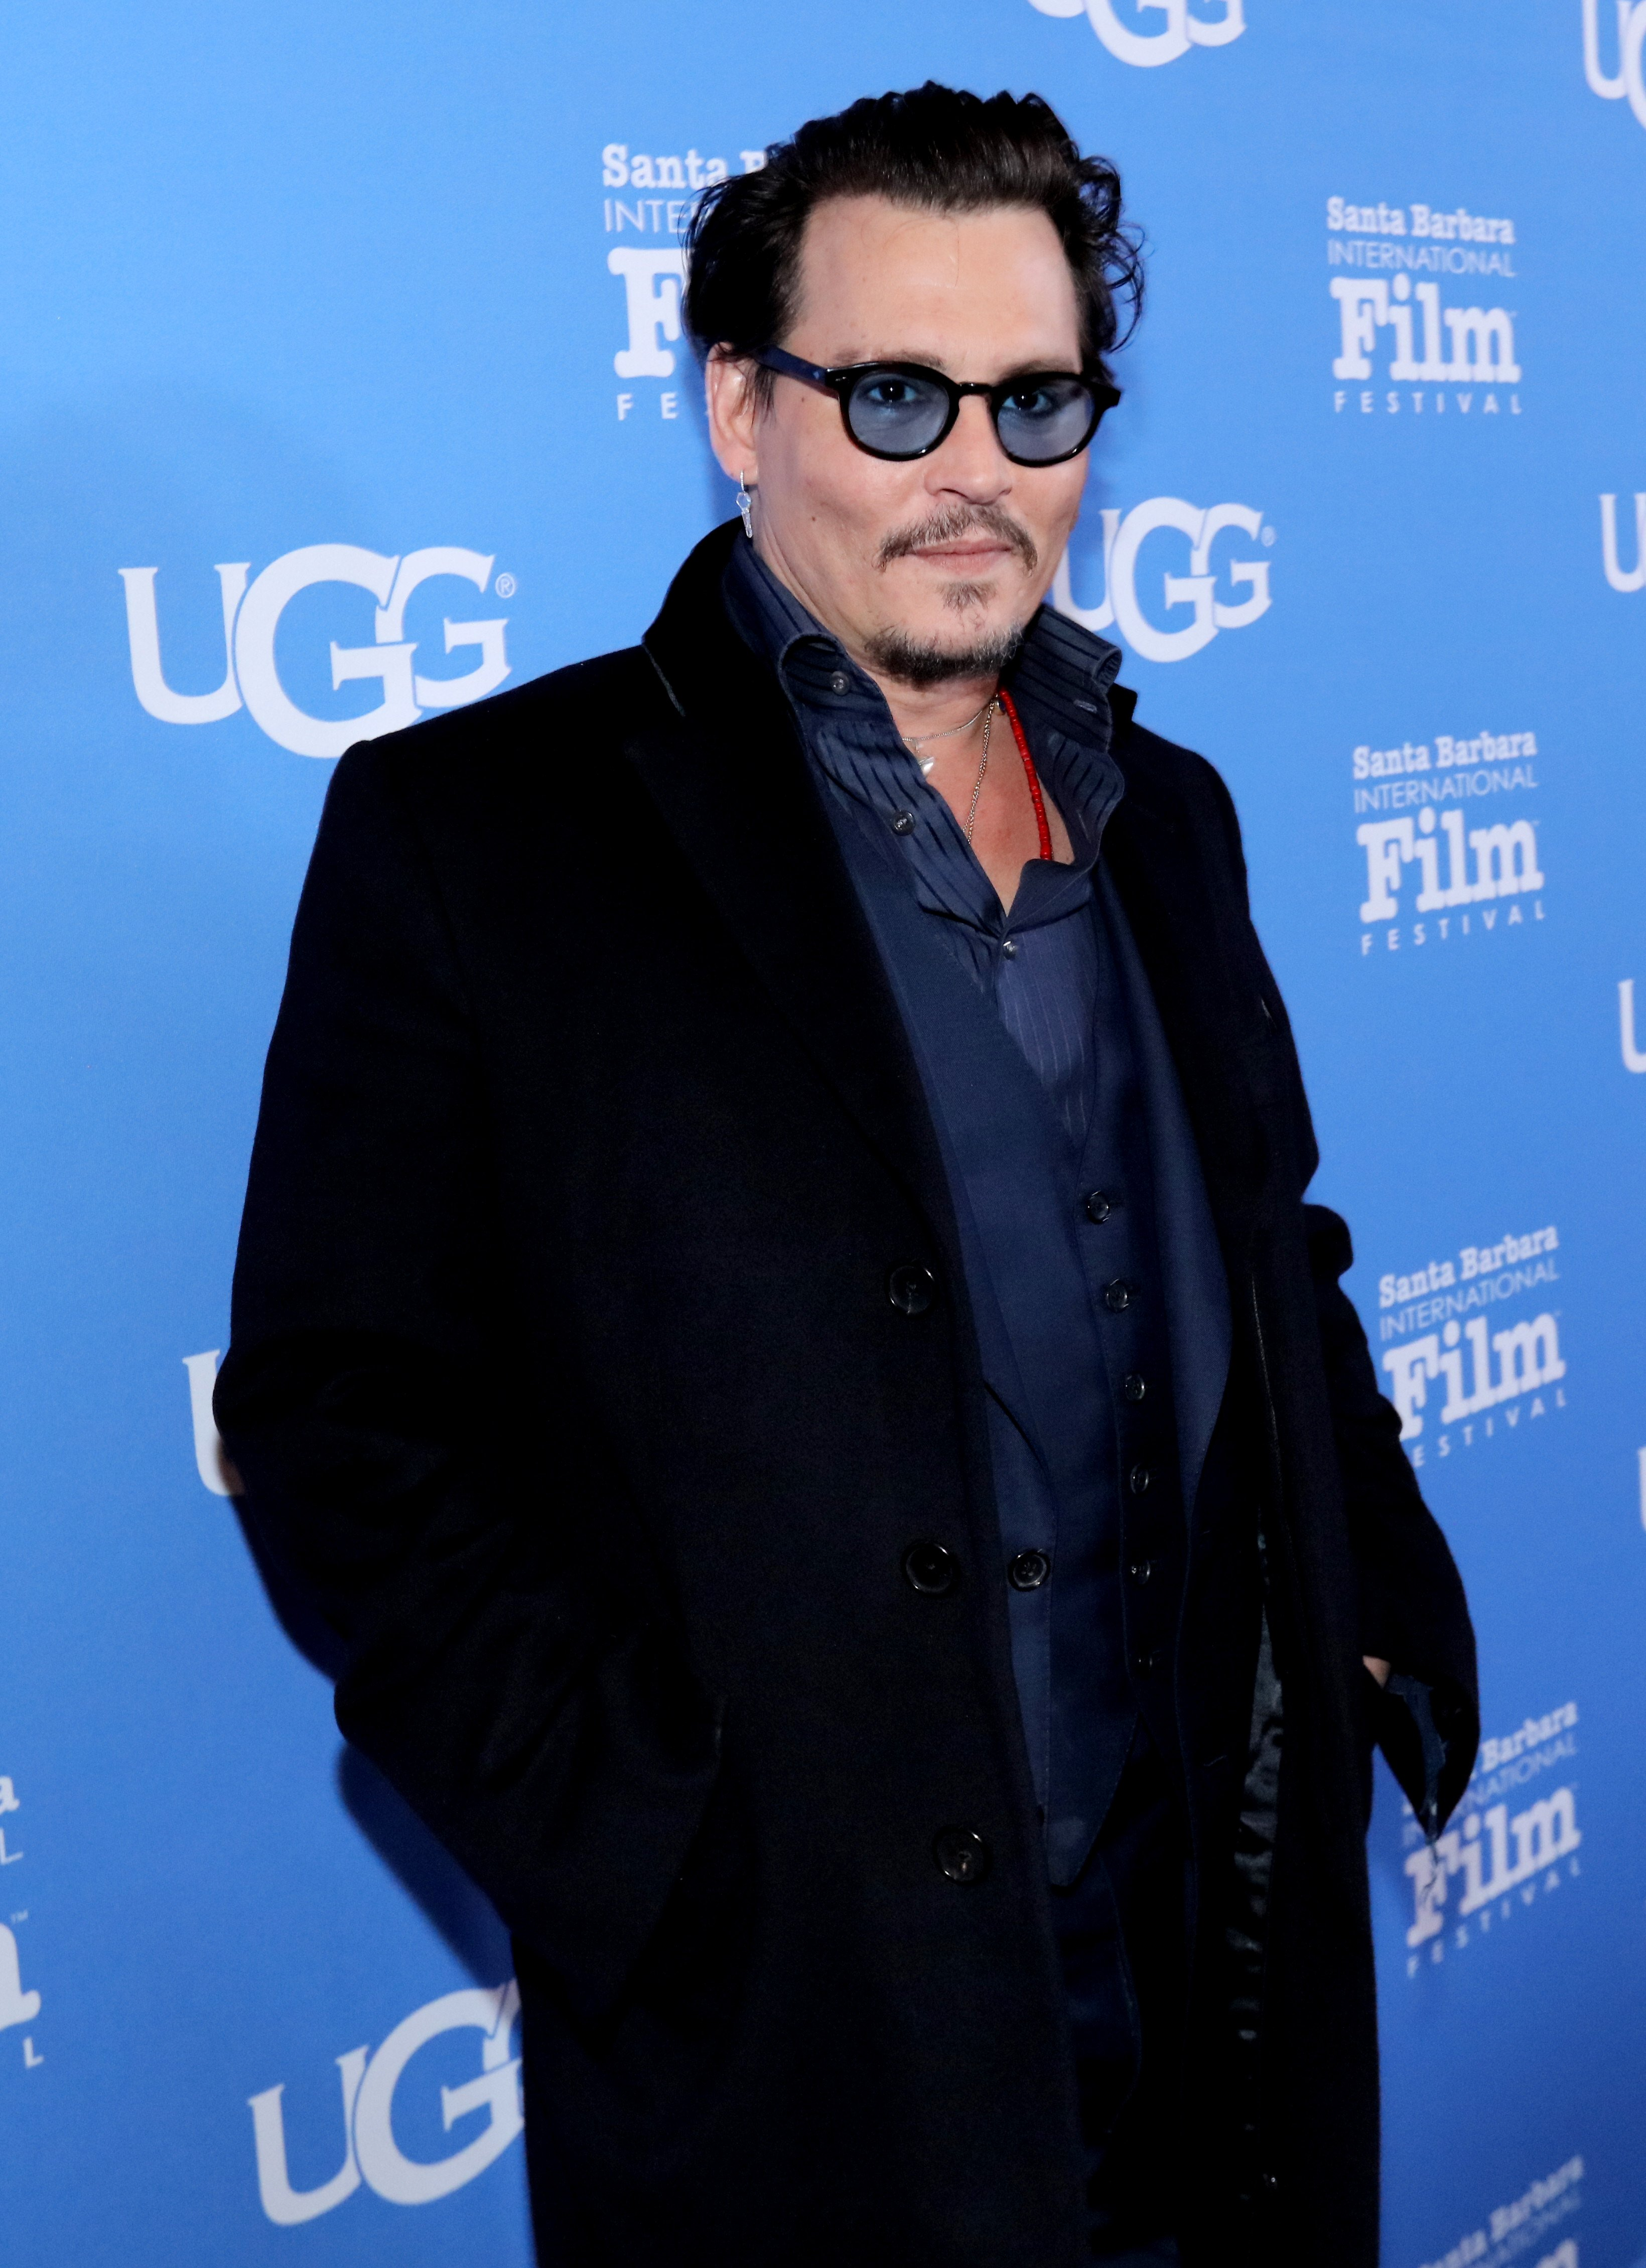 Johnny Depp attends the Maltin Modern Master award tribute during the 31st Santa Barbara International Film Festival at the Arlington Theater on February 4, 2016 in Santa Barbara